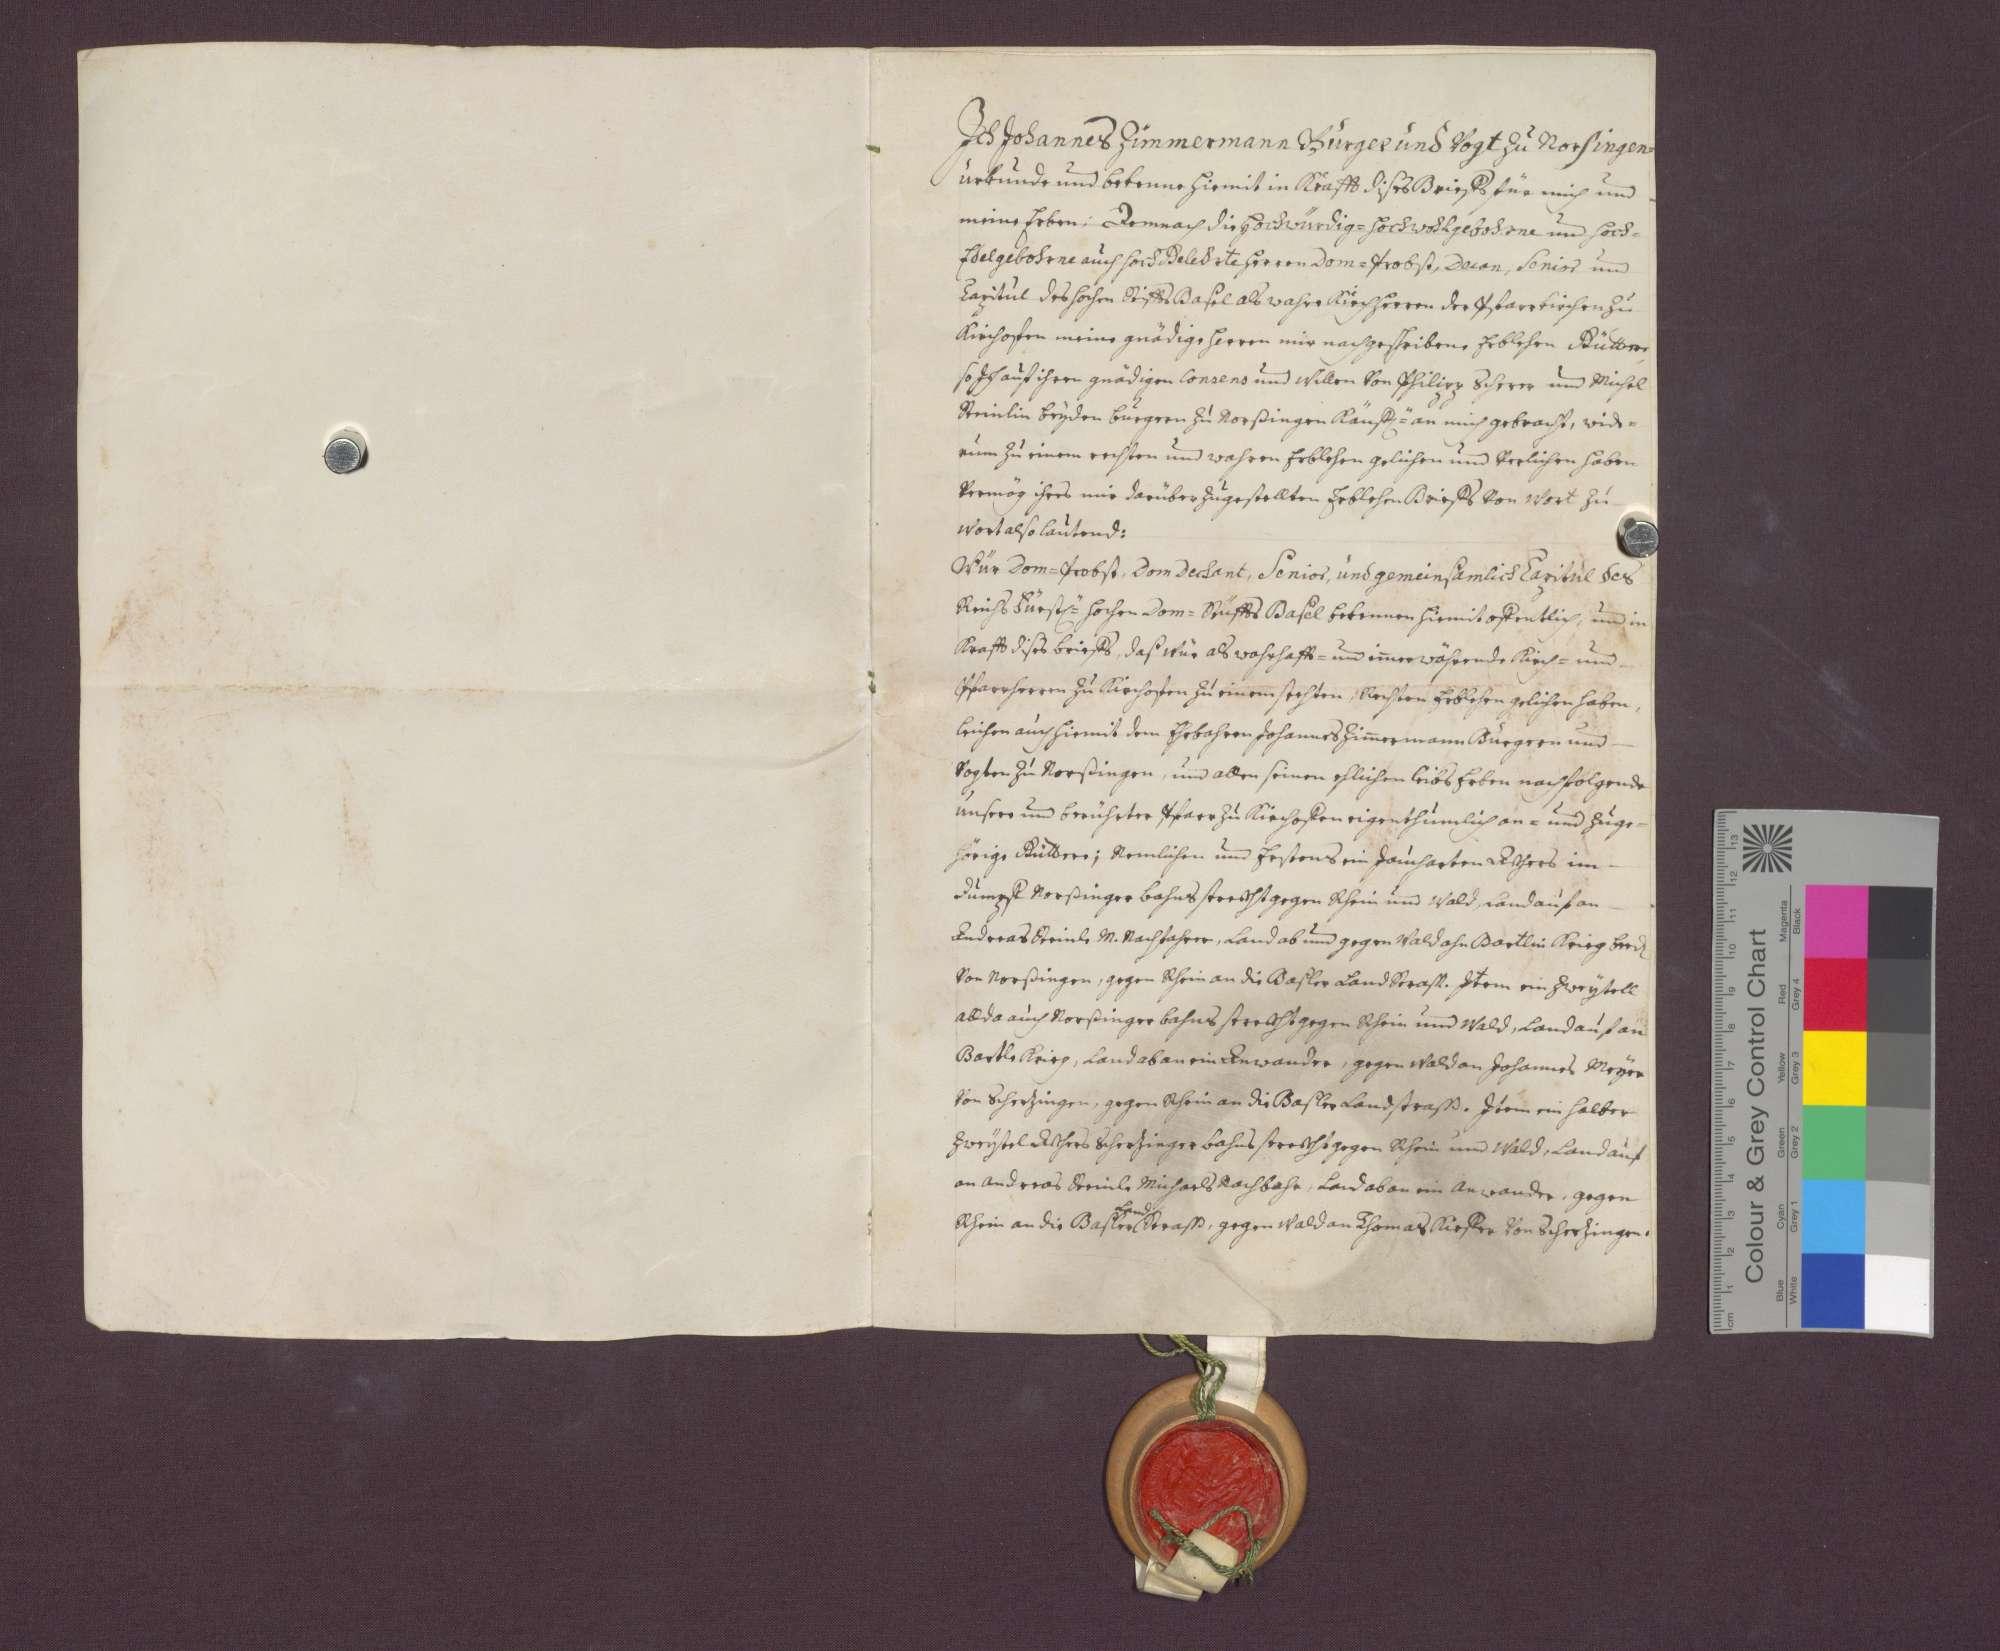 Lehnrevers des Johannes Zimmermann gegenüber dem Basler Domkapitel., Bild 2